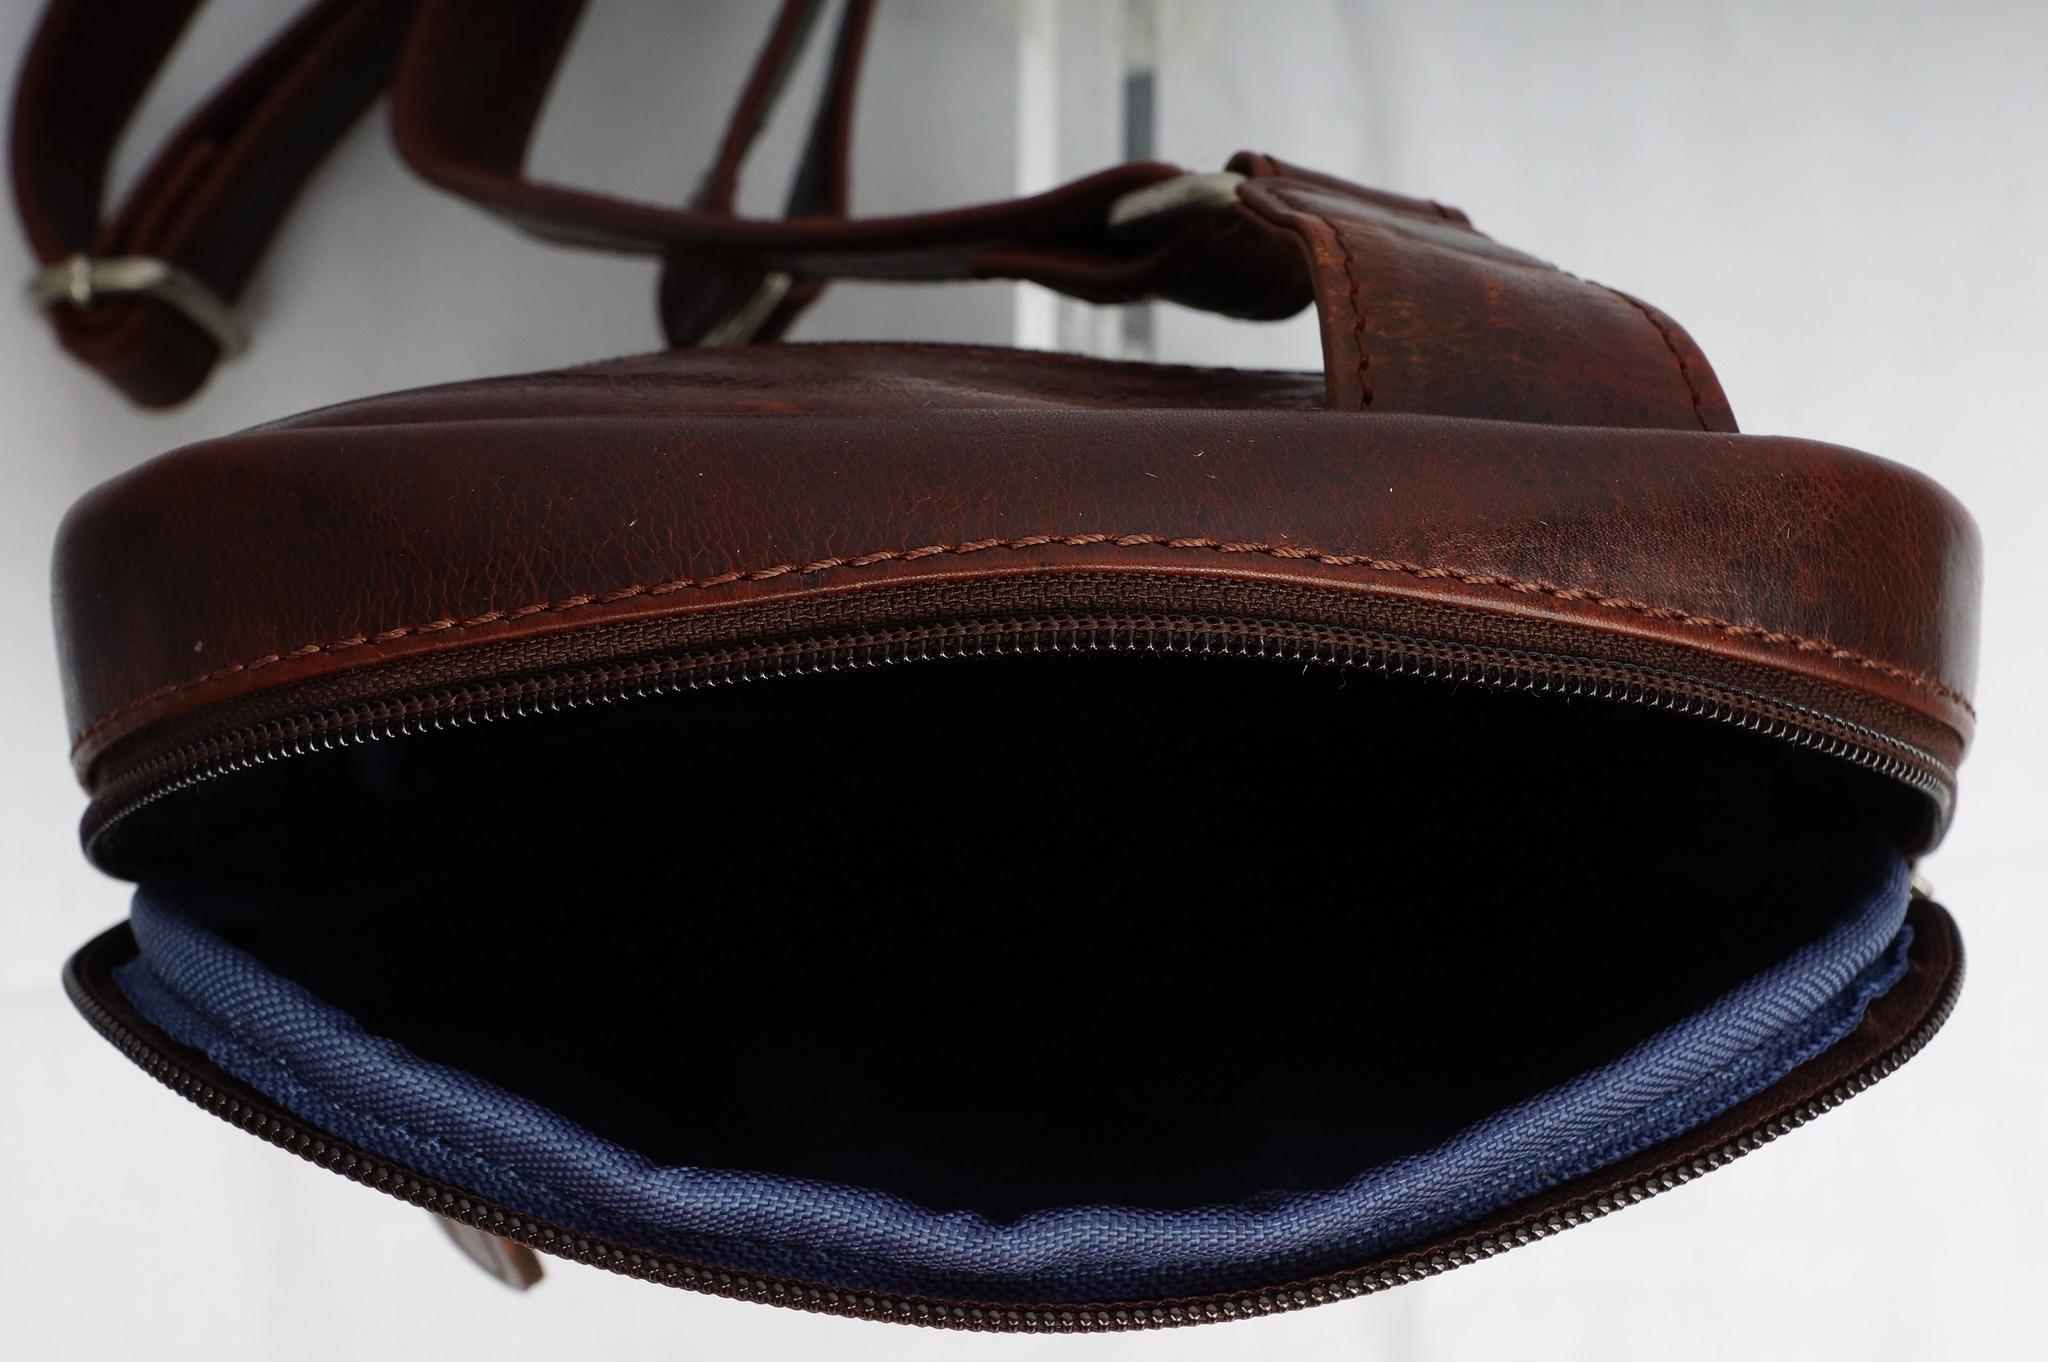 Arpello Old School cross-over bag